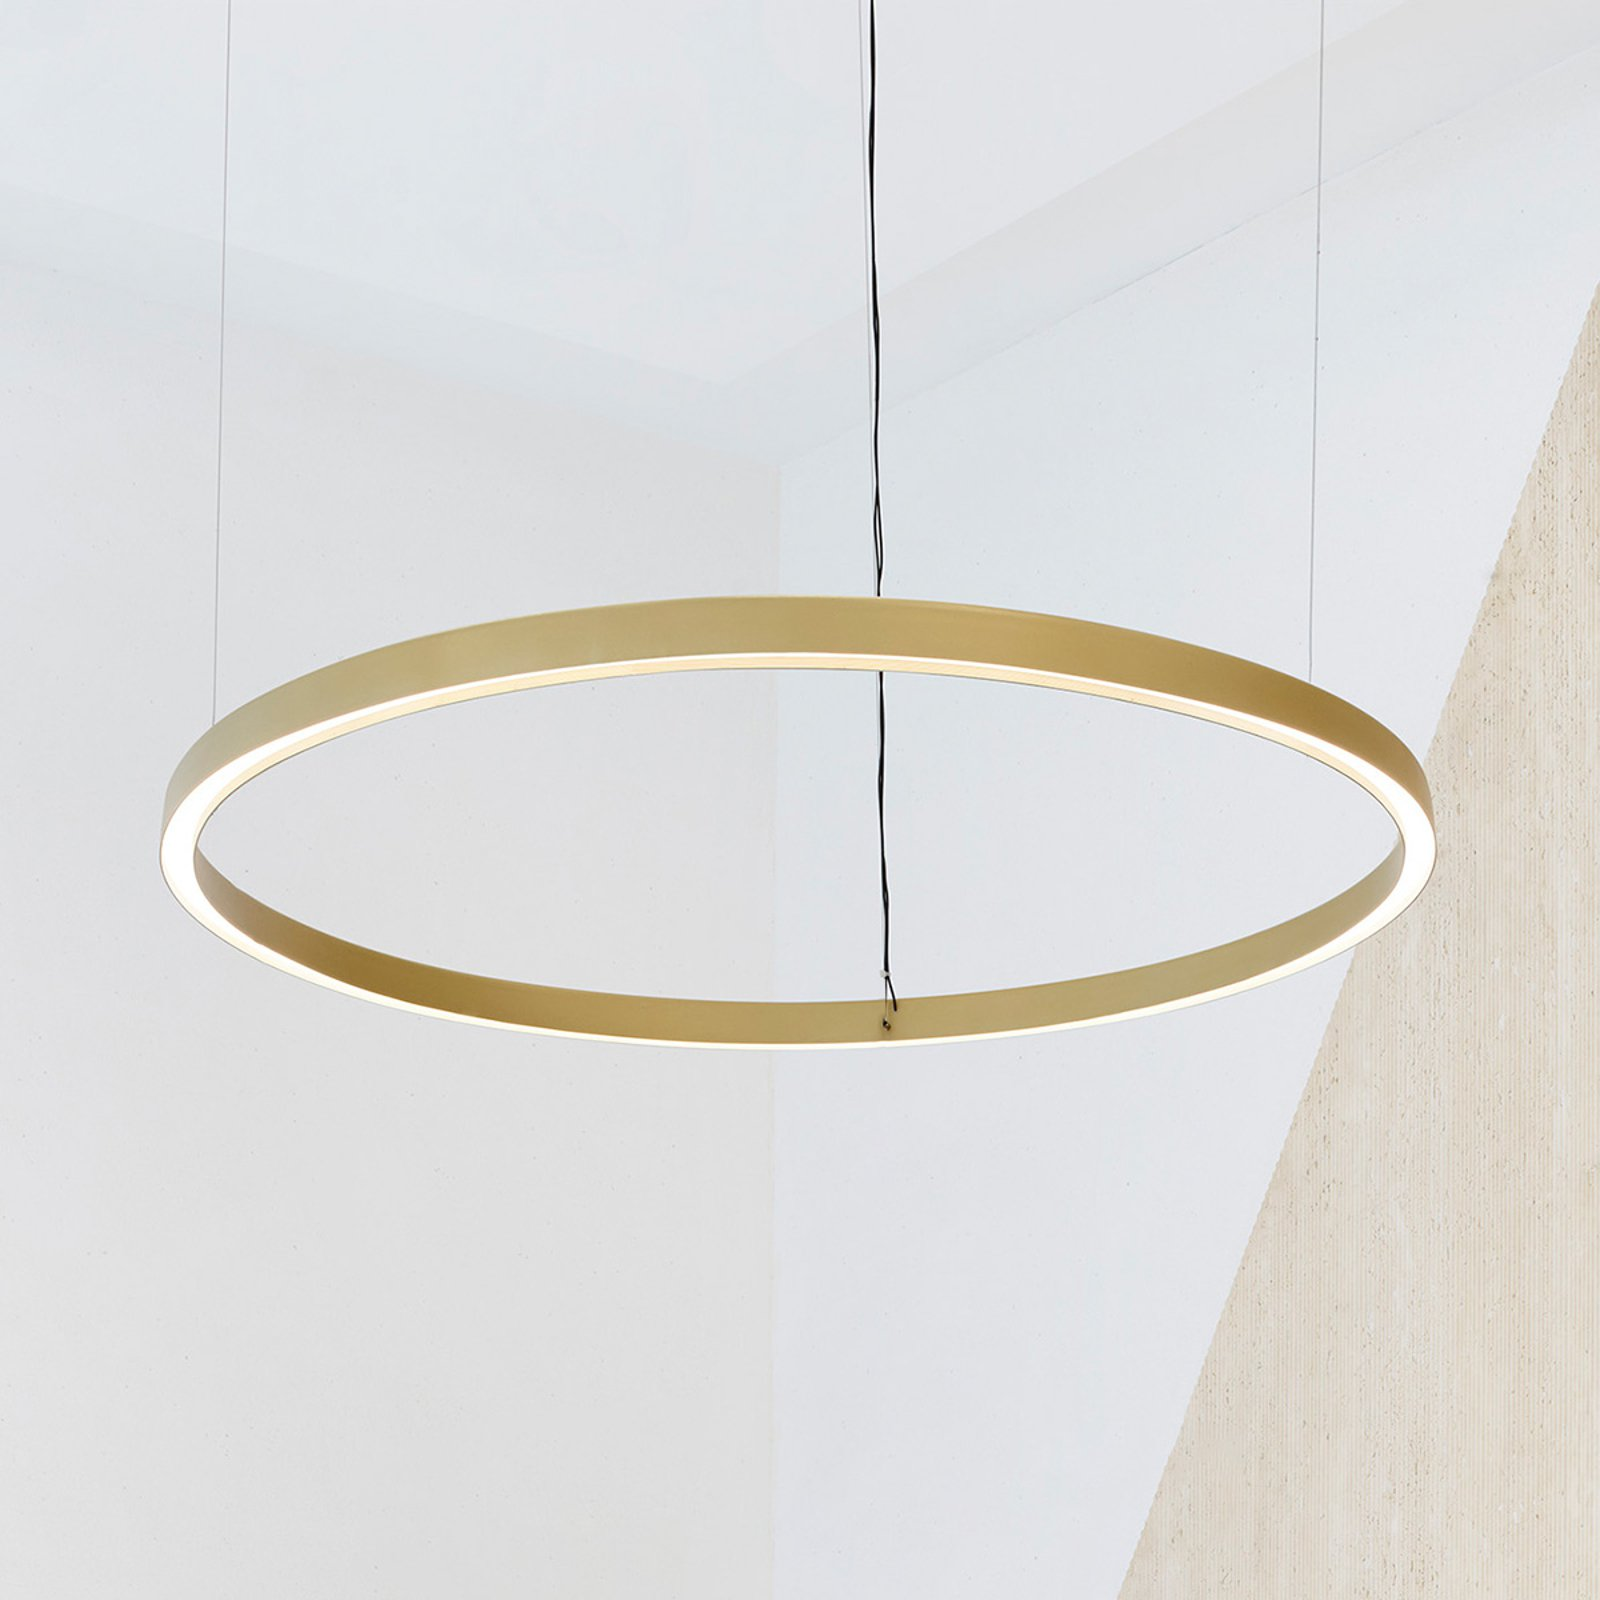 Luceplan Compendium Circle 110 cm, messing